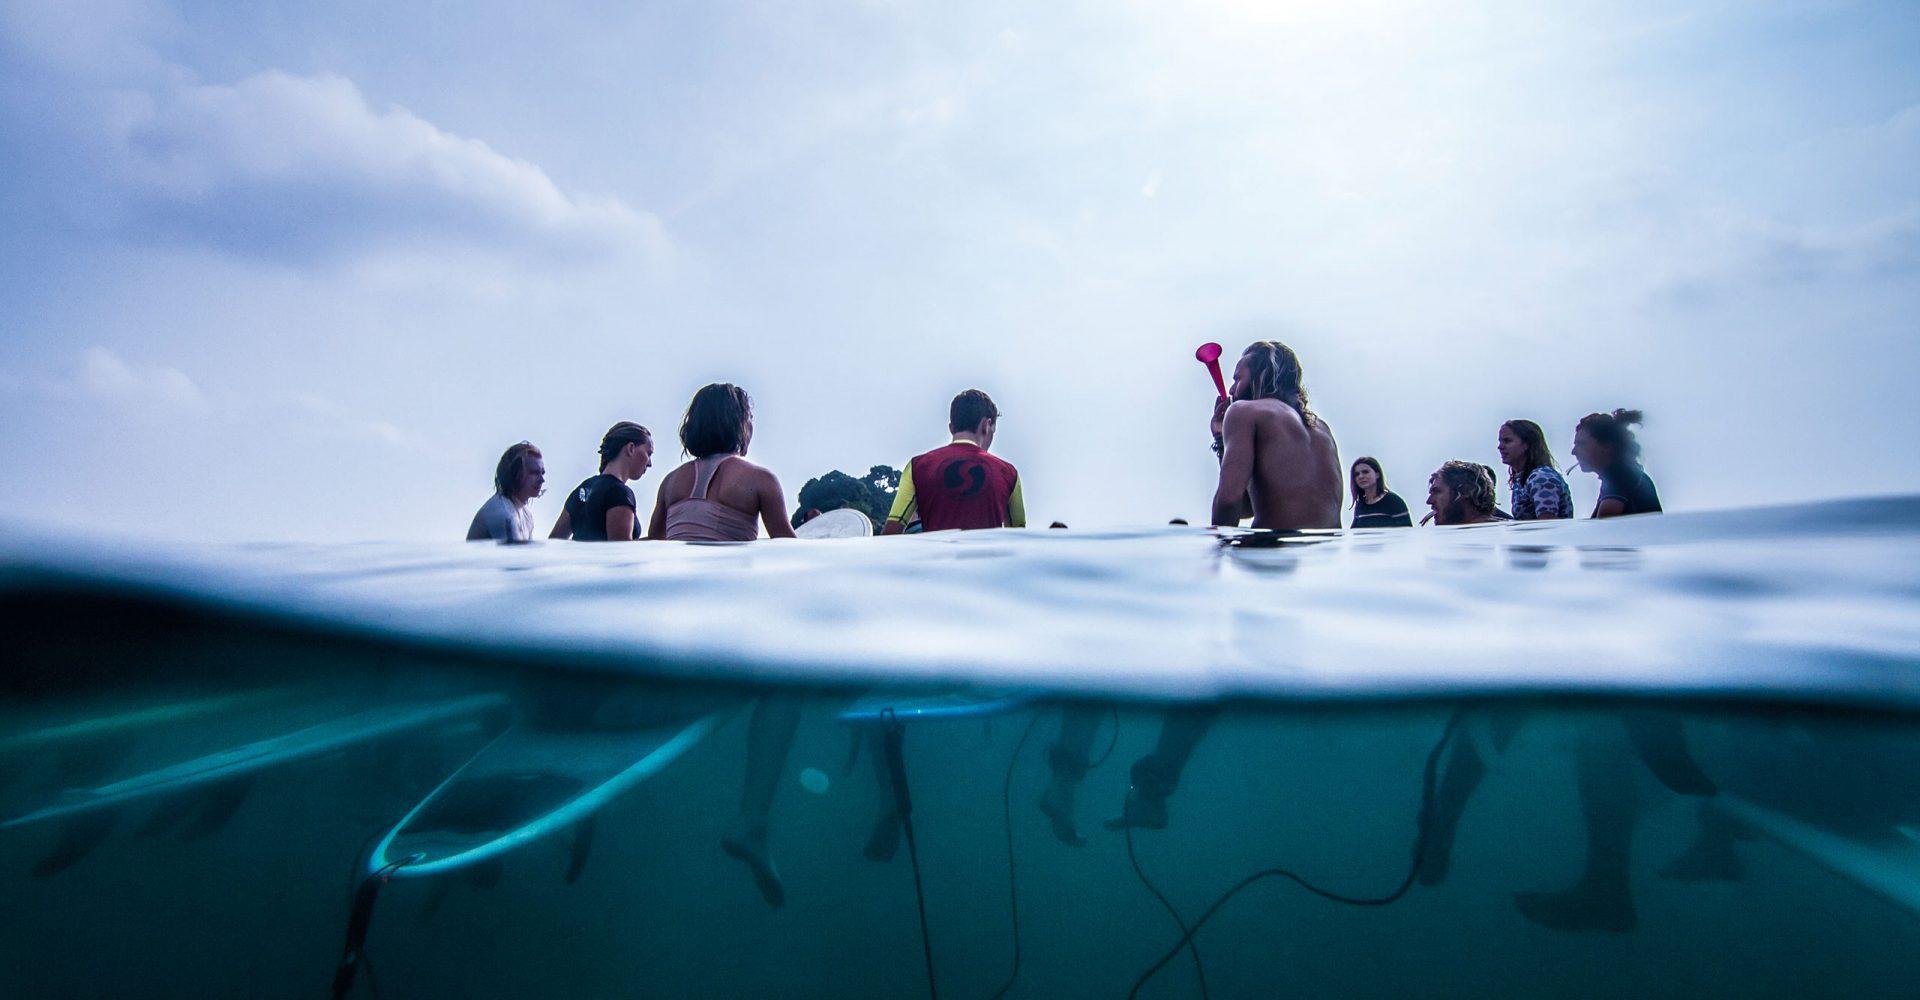 BTS Sri Lanka surf camp group paddle out